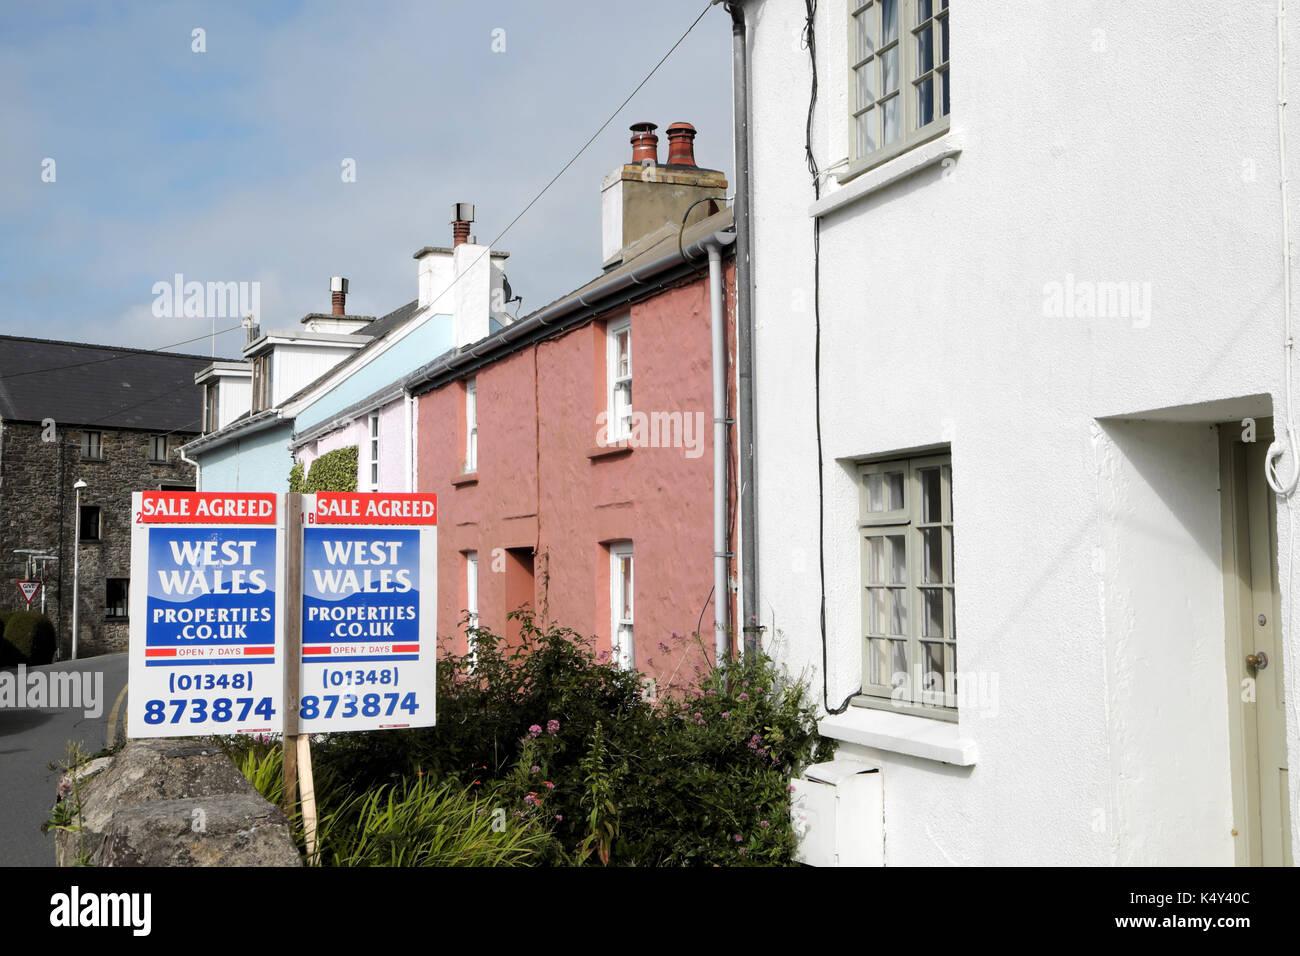 Sale Agreed estate agent sign outside cottage property in St Davids Pembrokeshire, West Wales UK    KATHY DEWITT - Stock Image